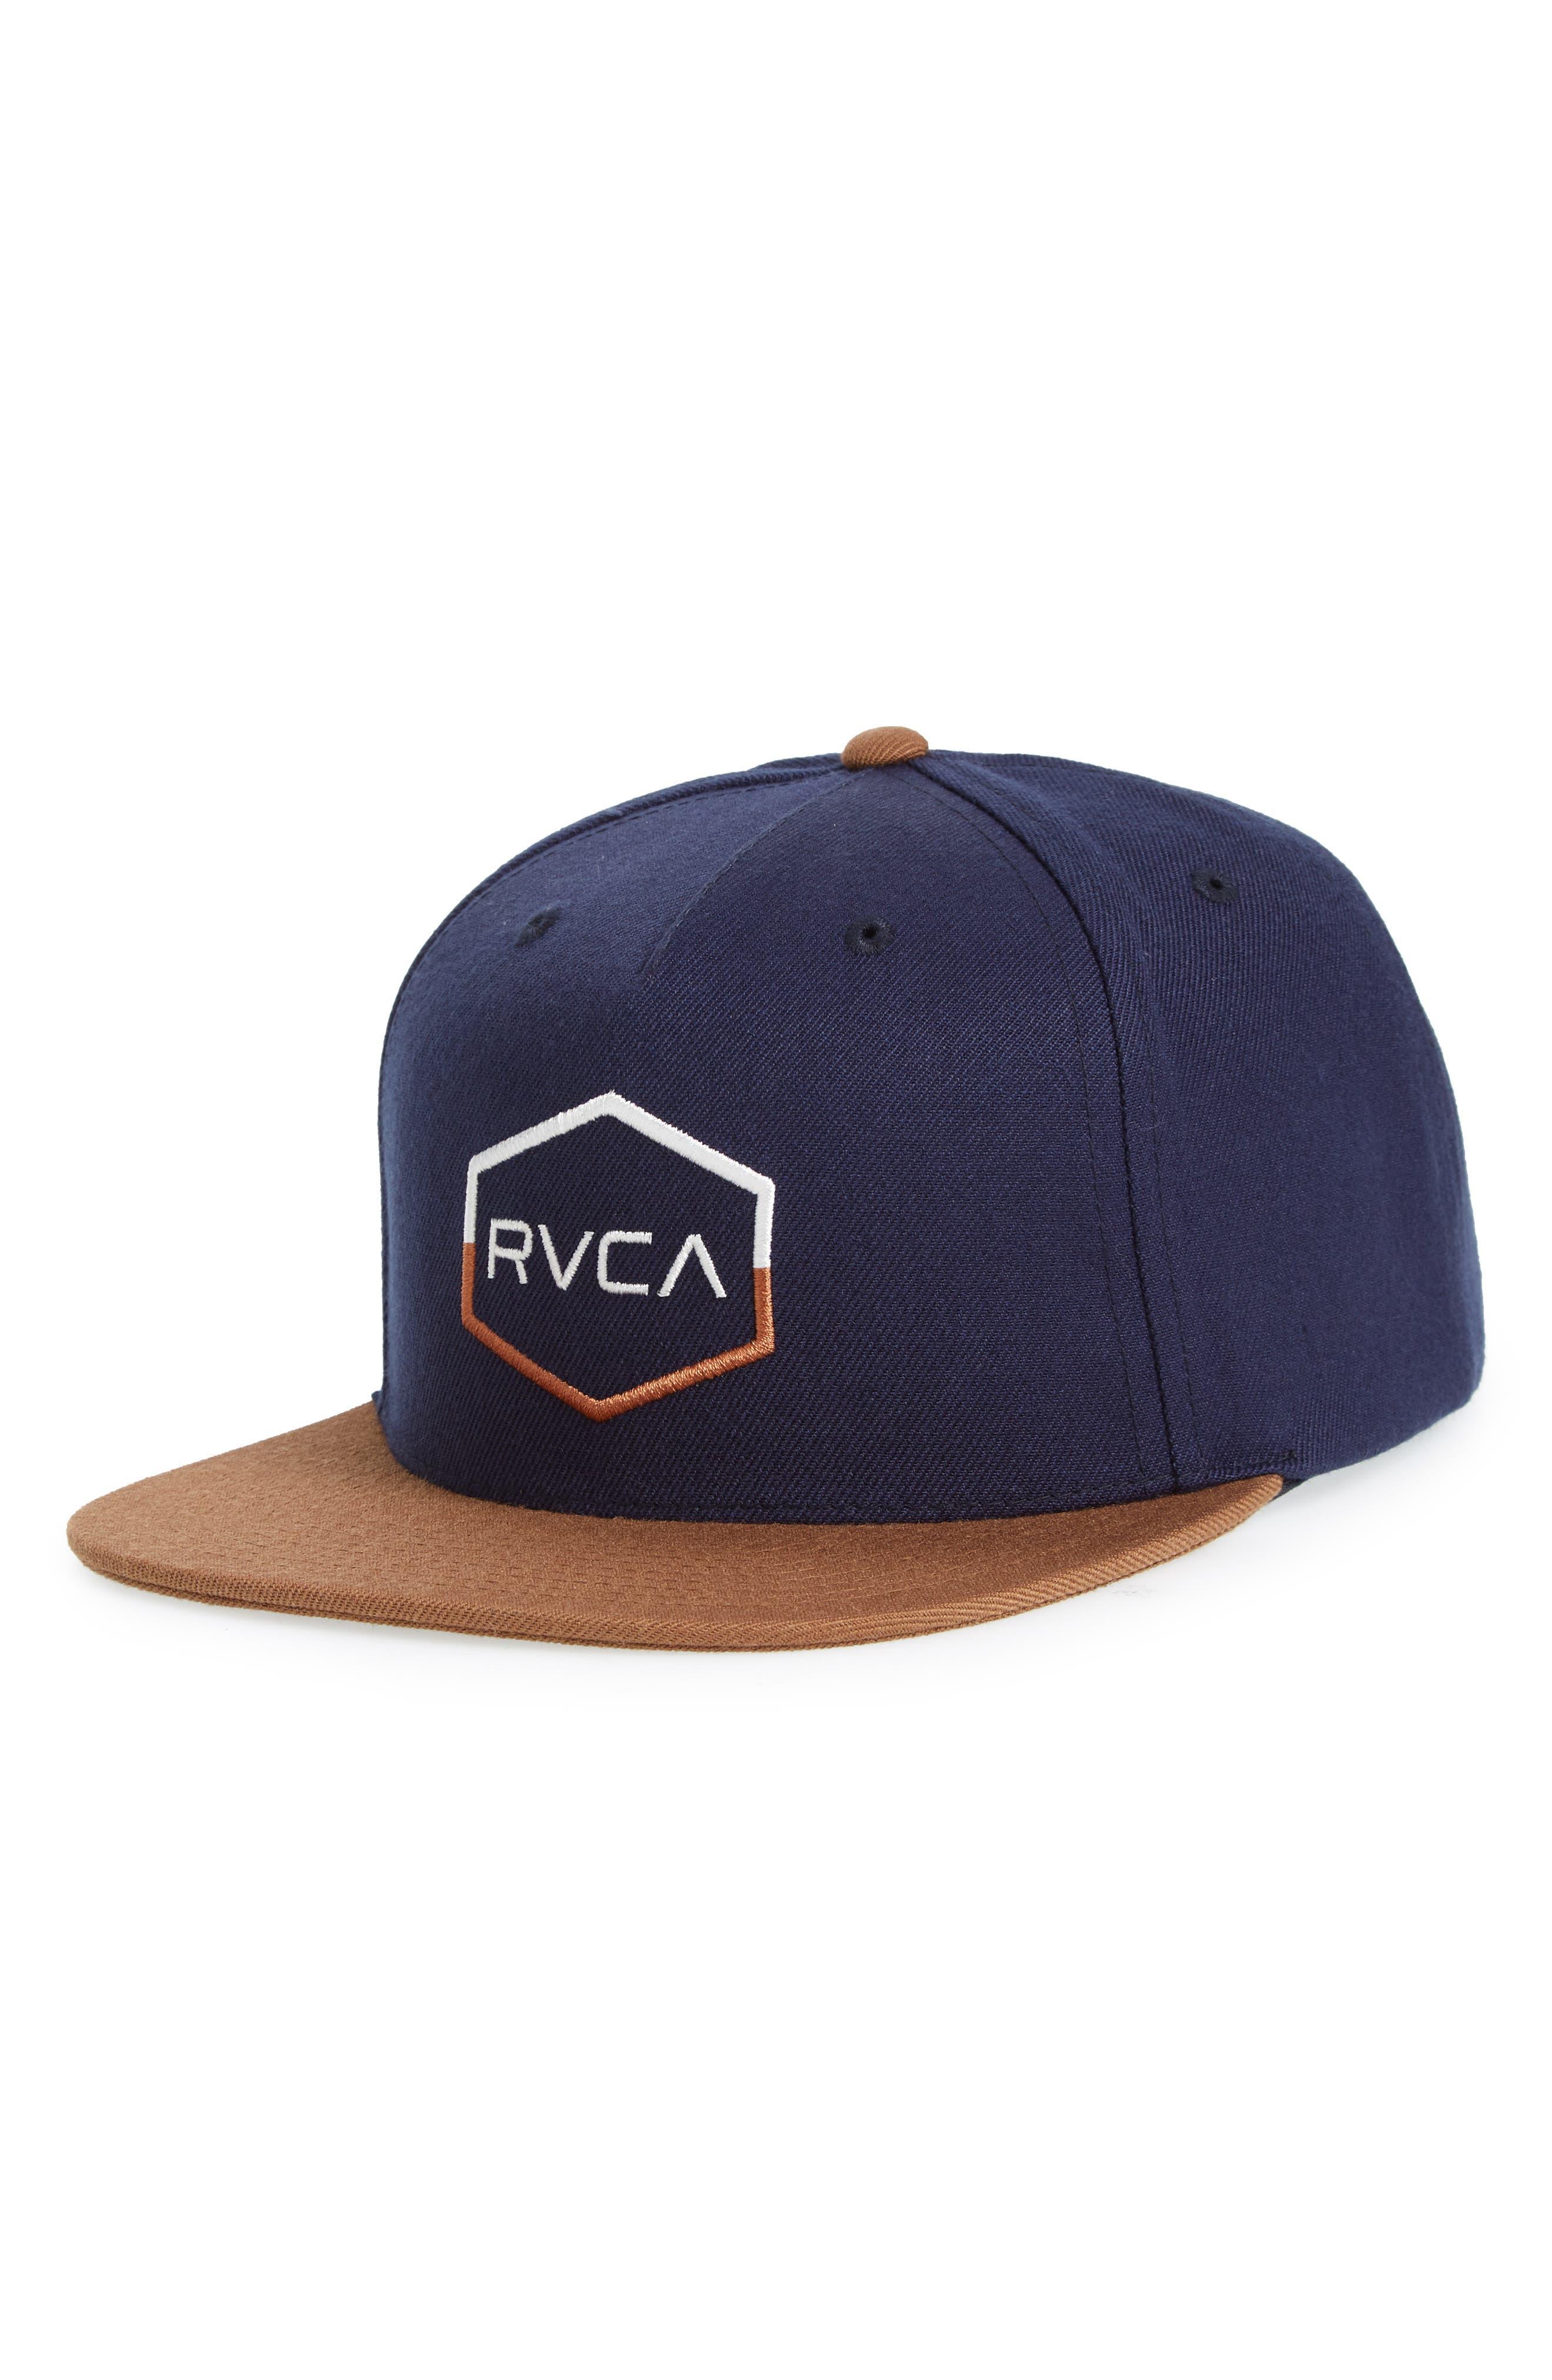 Commonwealth III Snapback Hat,                             Main thumbnail 1, color,                             400